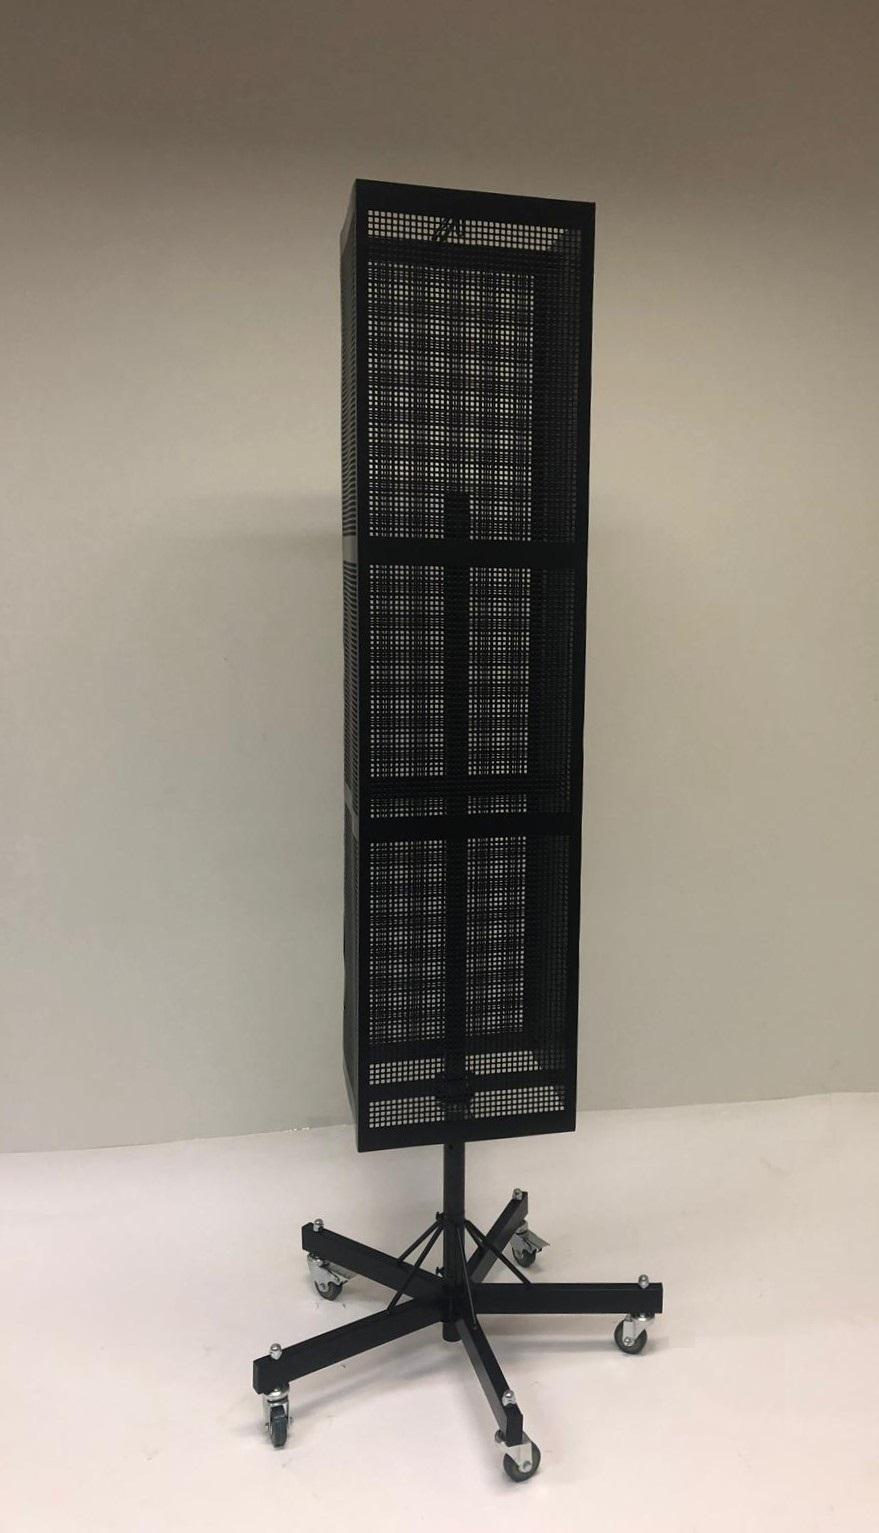 BU930N-Buyck Display-